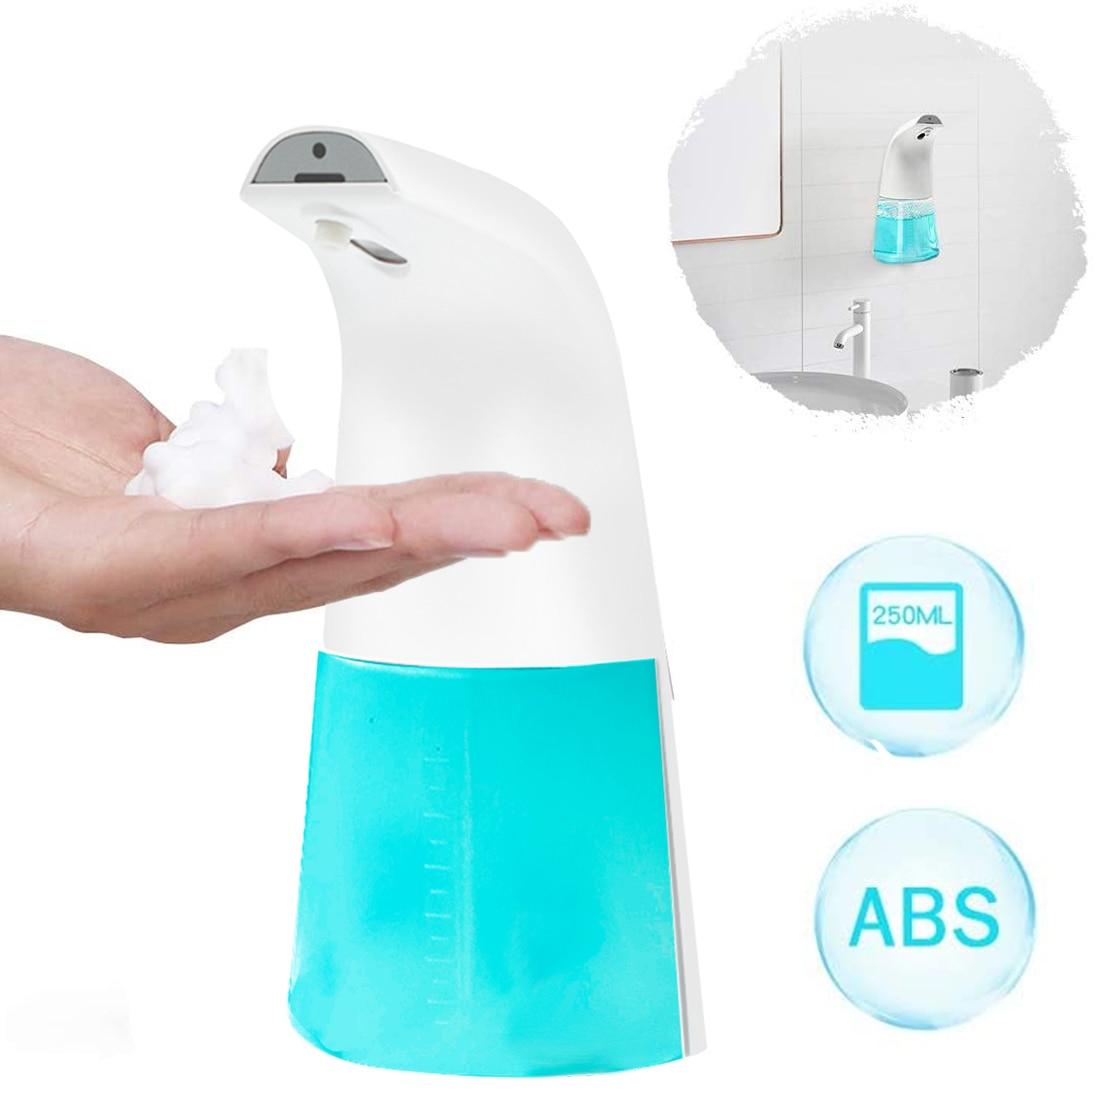 Infrared Foam Soap Dispenser Automatic Liquid Soap Dispenser Induction Sensing Hand Sanitizer Bottle For Bathroom Kitchen Hotel